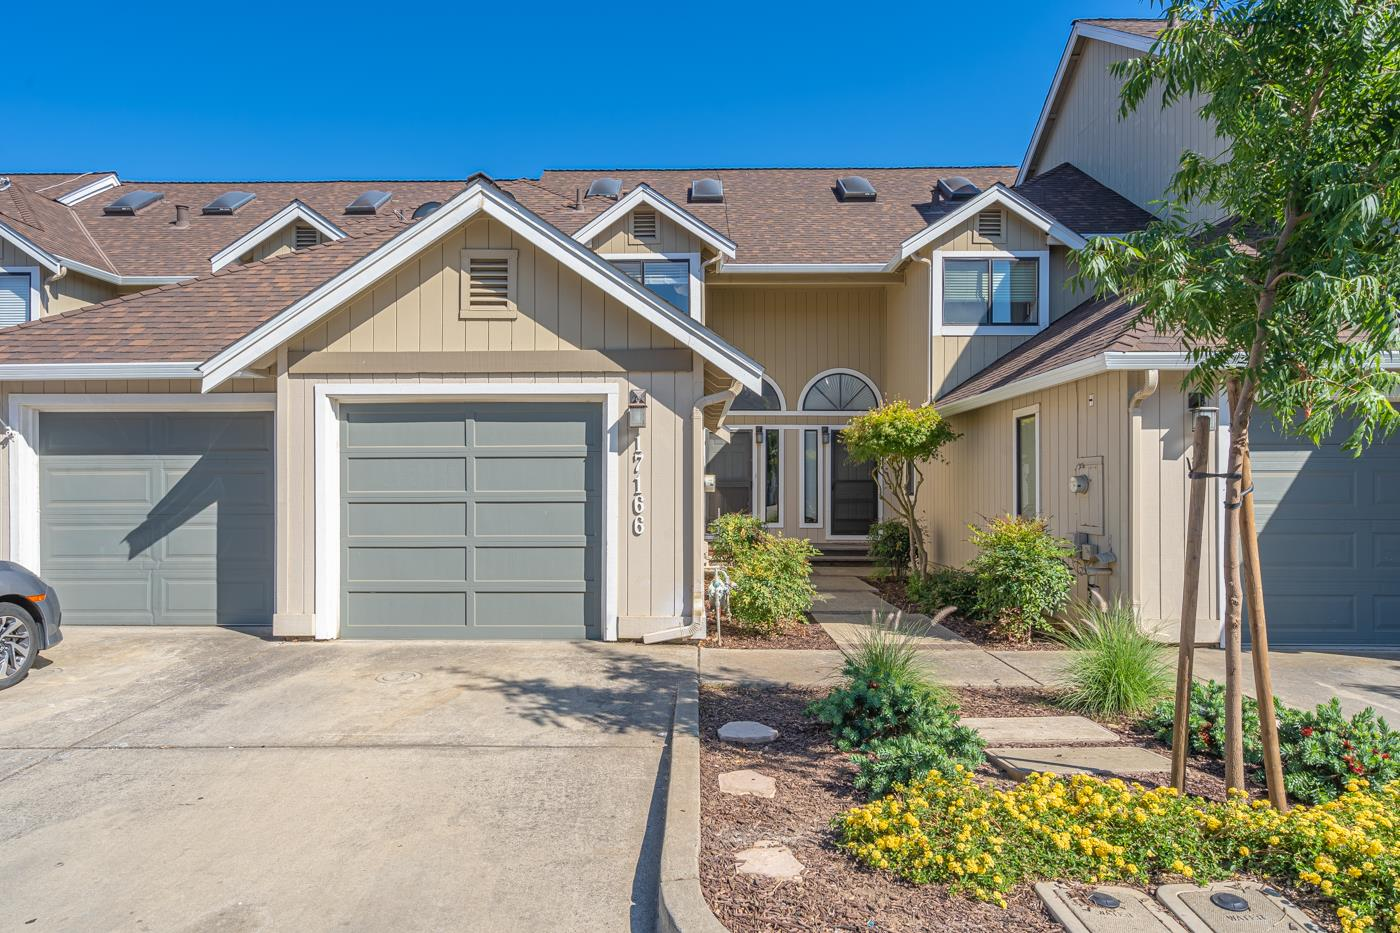 17166 Creekside CIR, Morgan Hill, California